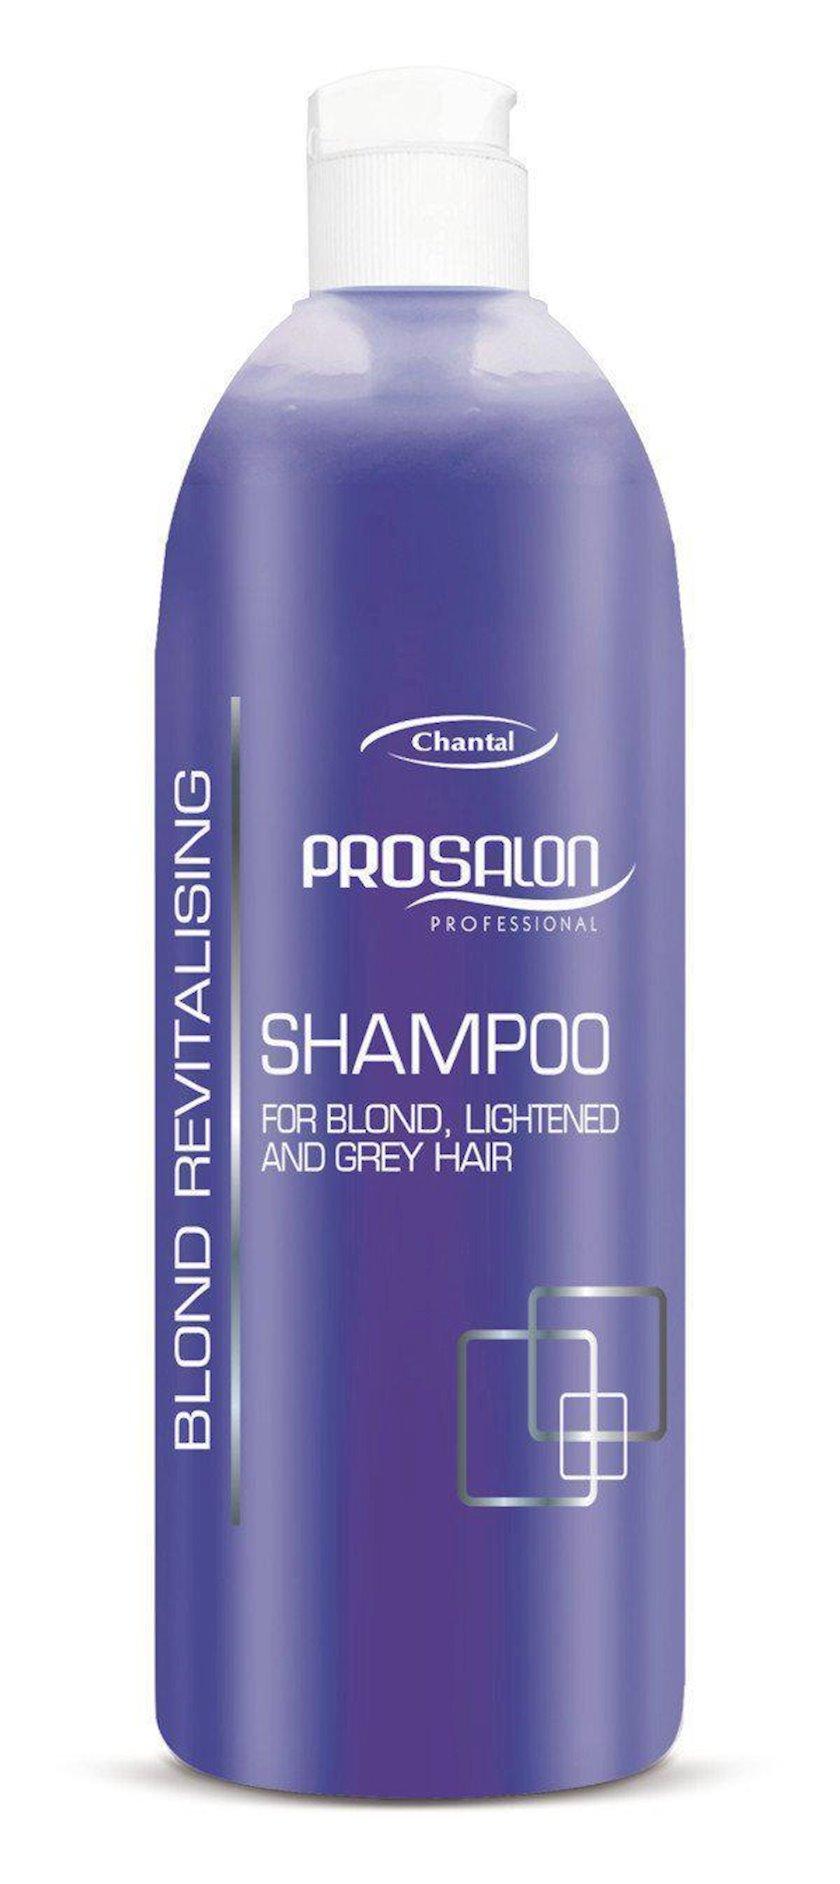 Şampun Prosalon Shampoo For Blond Lightened And Grey Hair, 500 ml